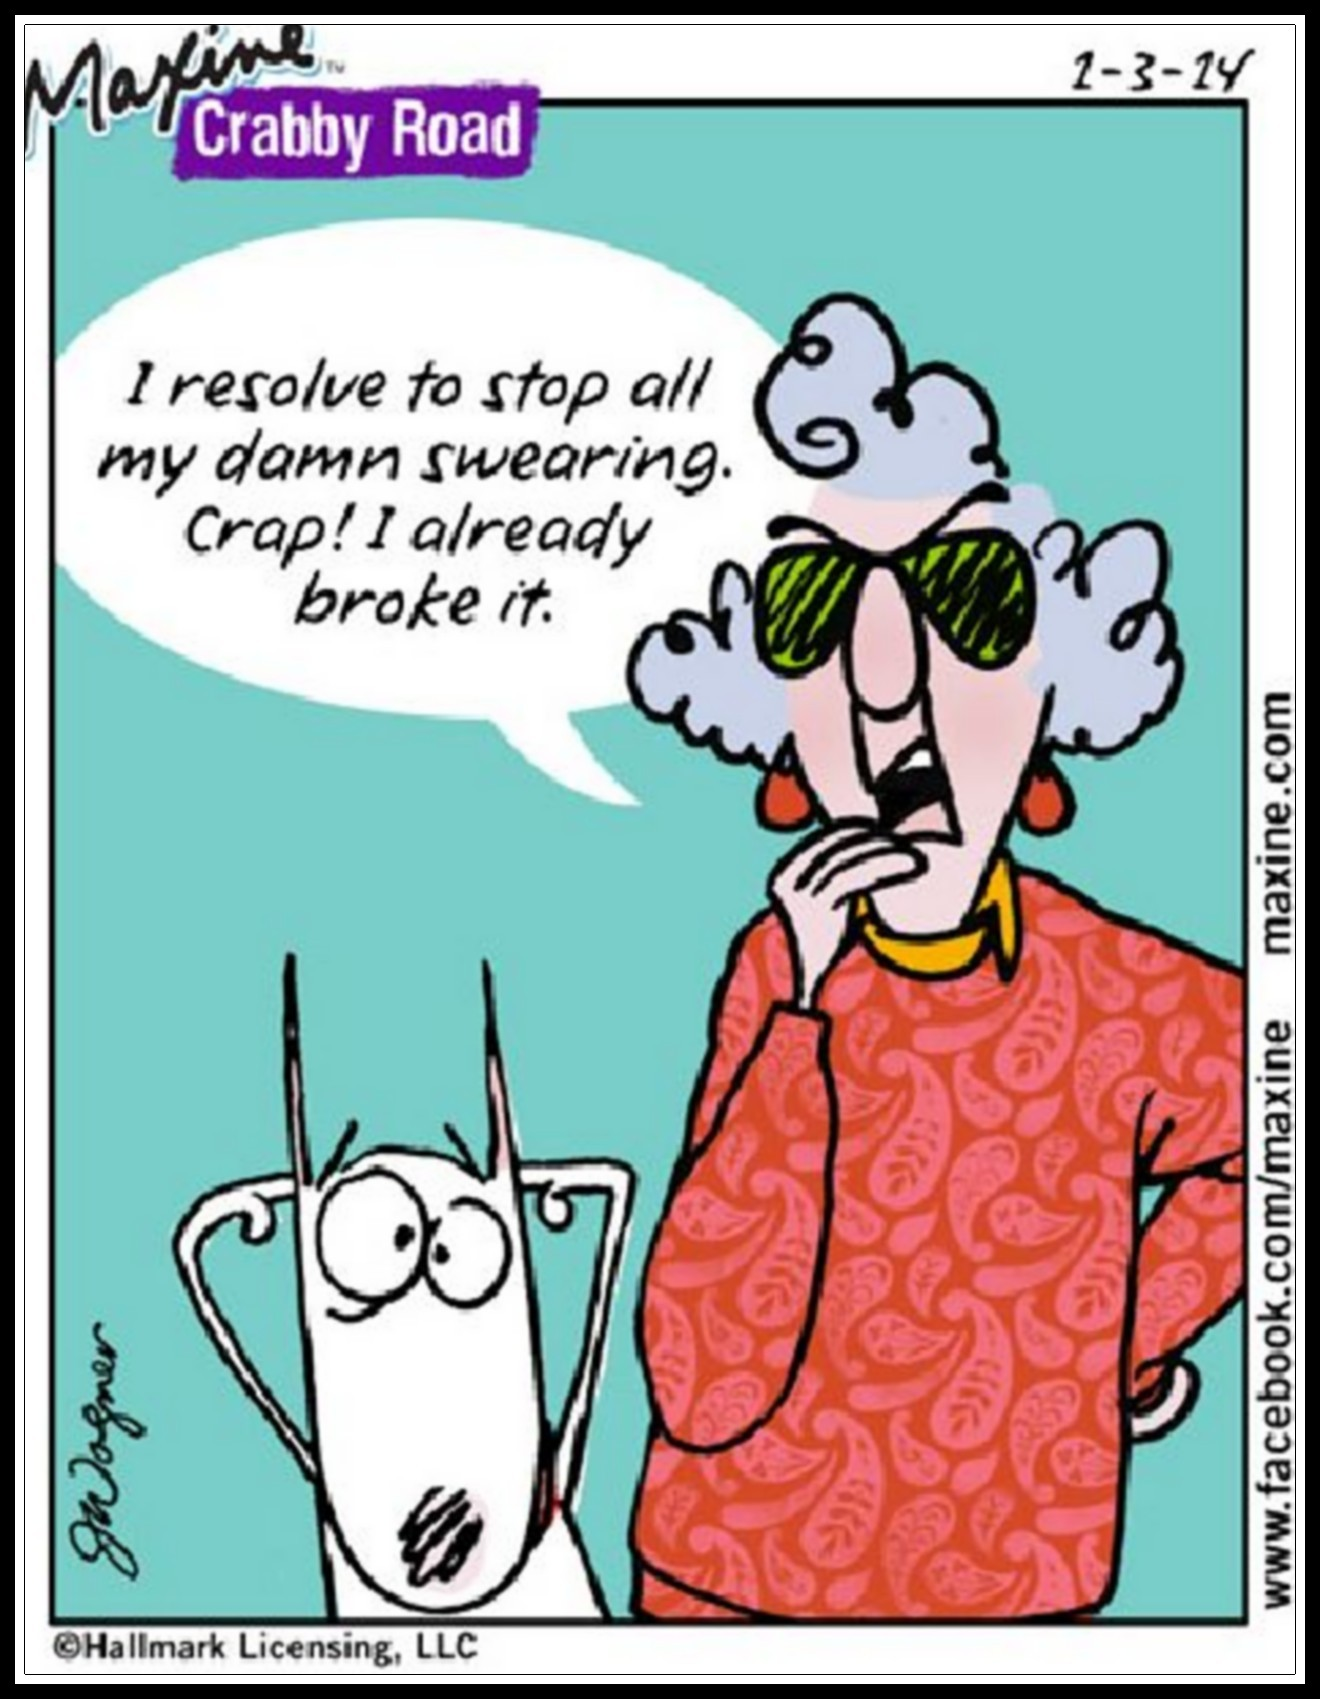 maxine cartoon funny crabby road year humor years resolutions daily bing person resolution acid sayings broken laugh female meme cartoons